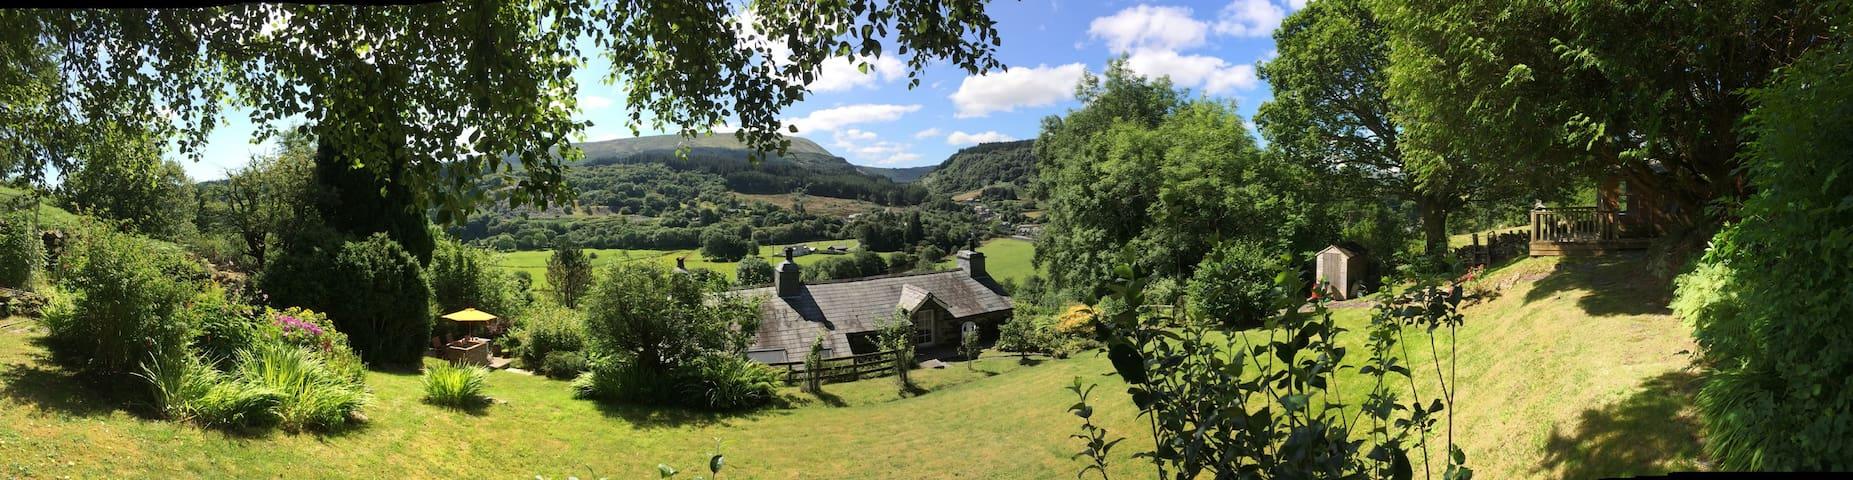 Bryn Teg cottage in Snowdonia - Dolwyddelan - Hus